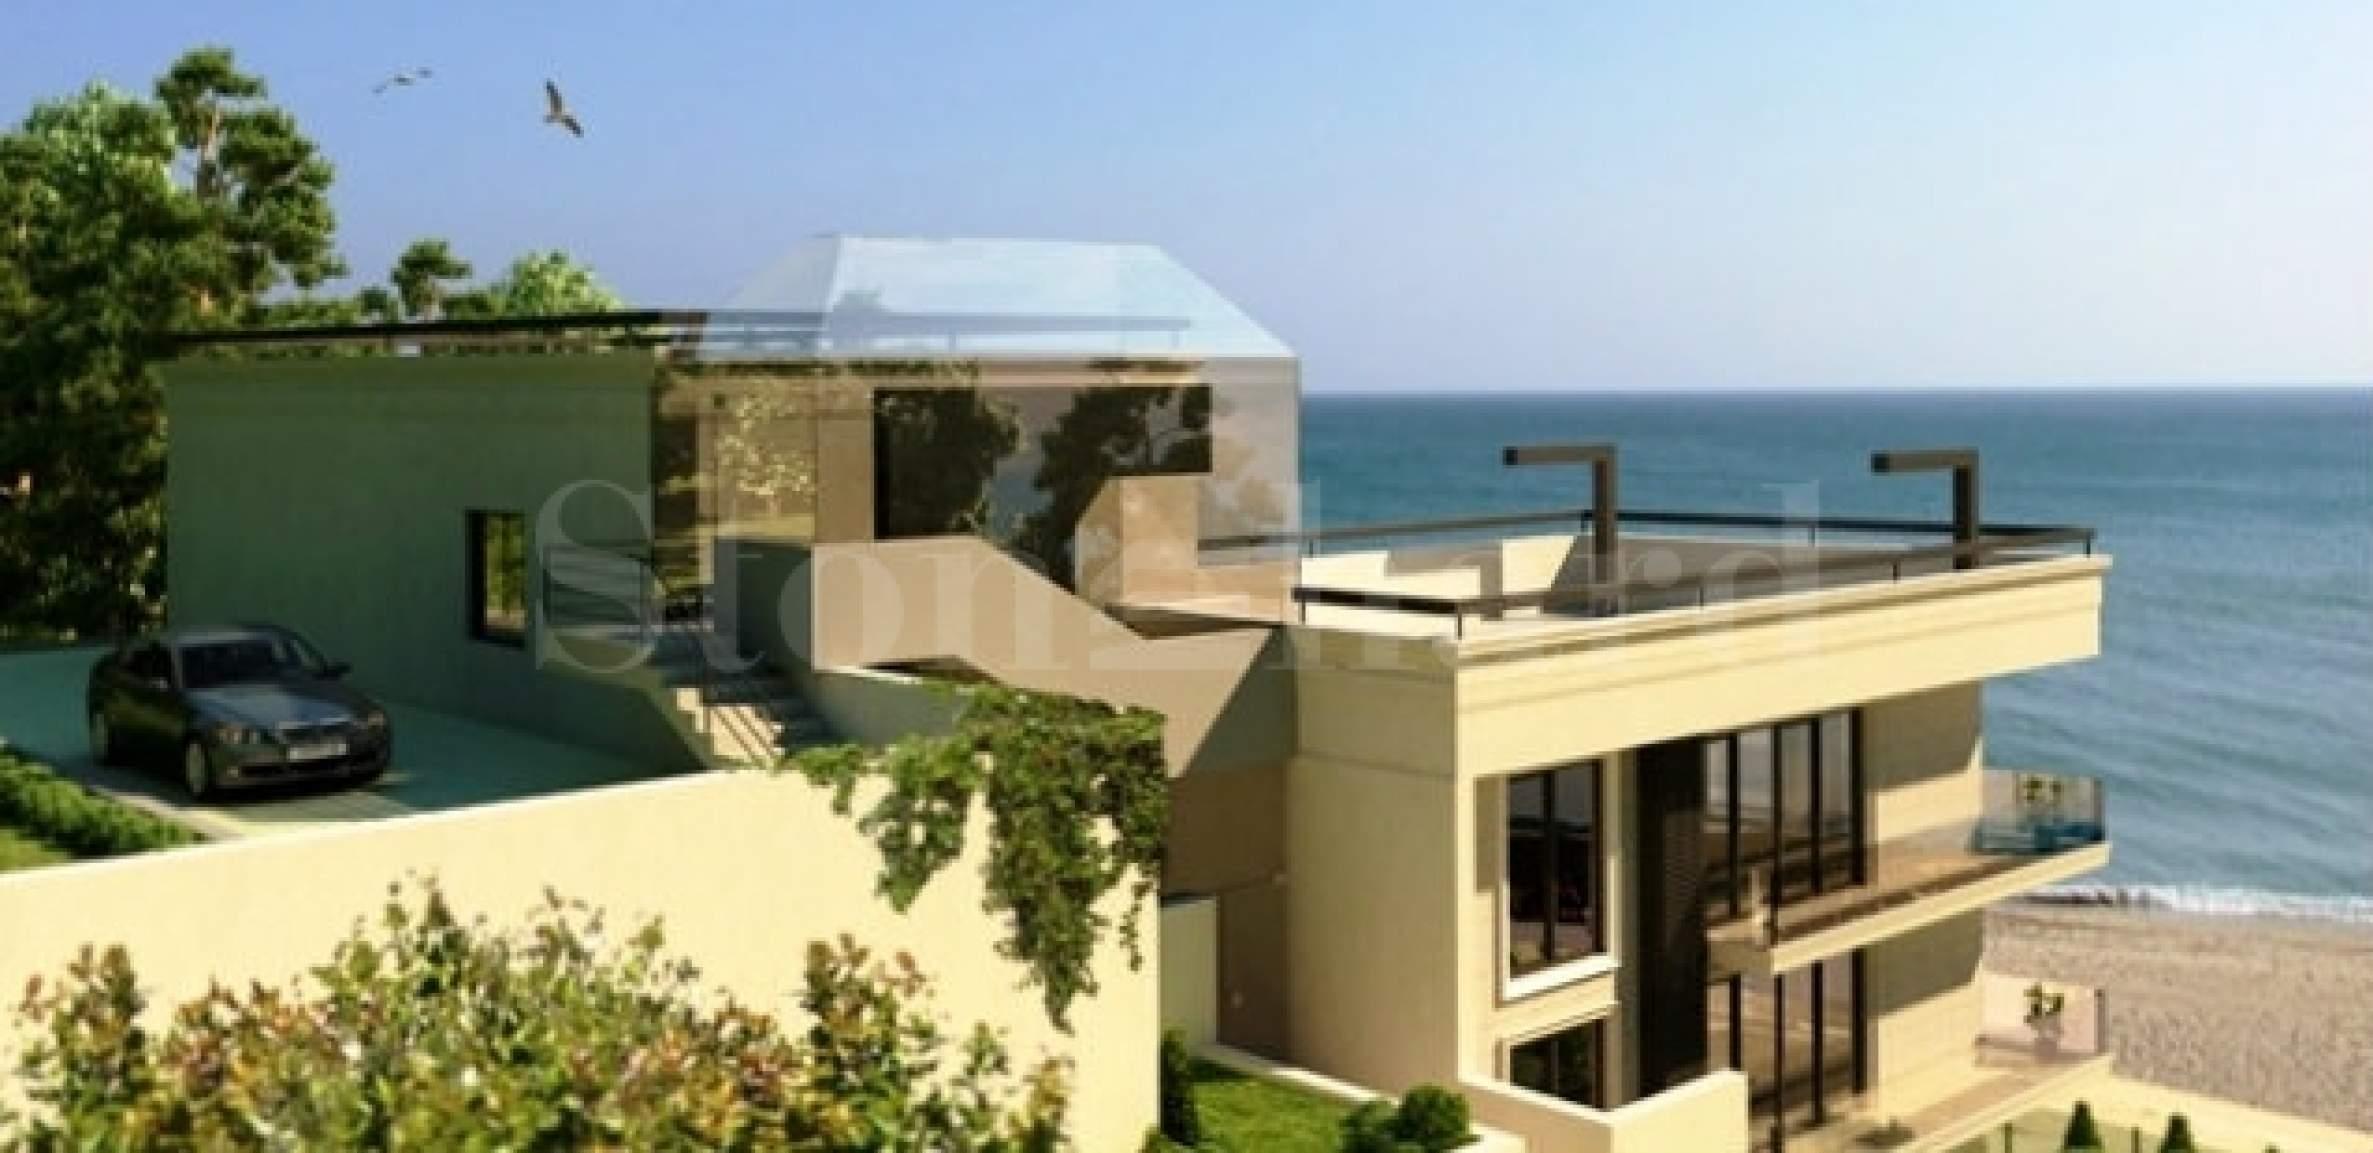 Апартаменти в комплекс на плажа1 - Stonehard